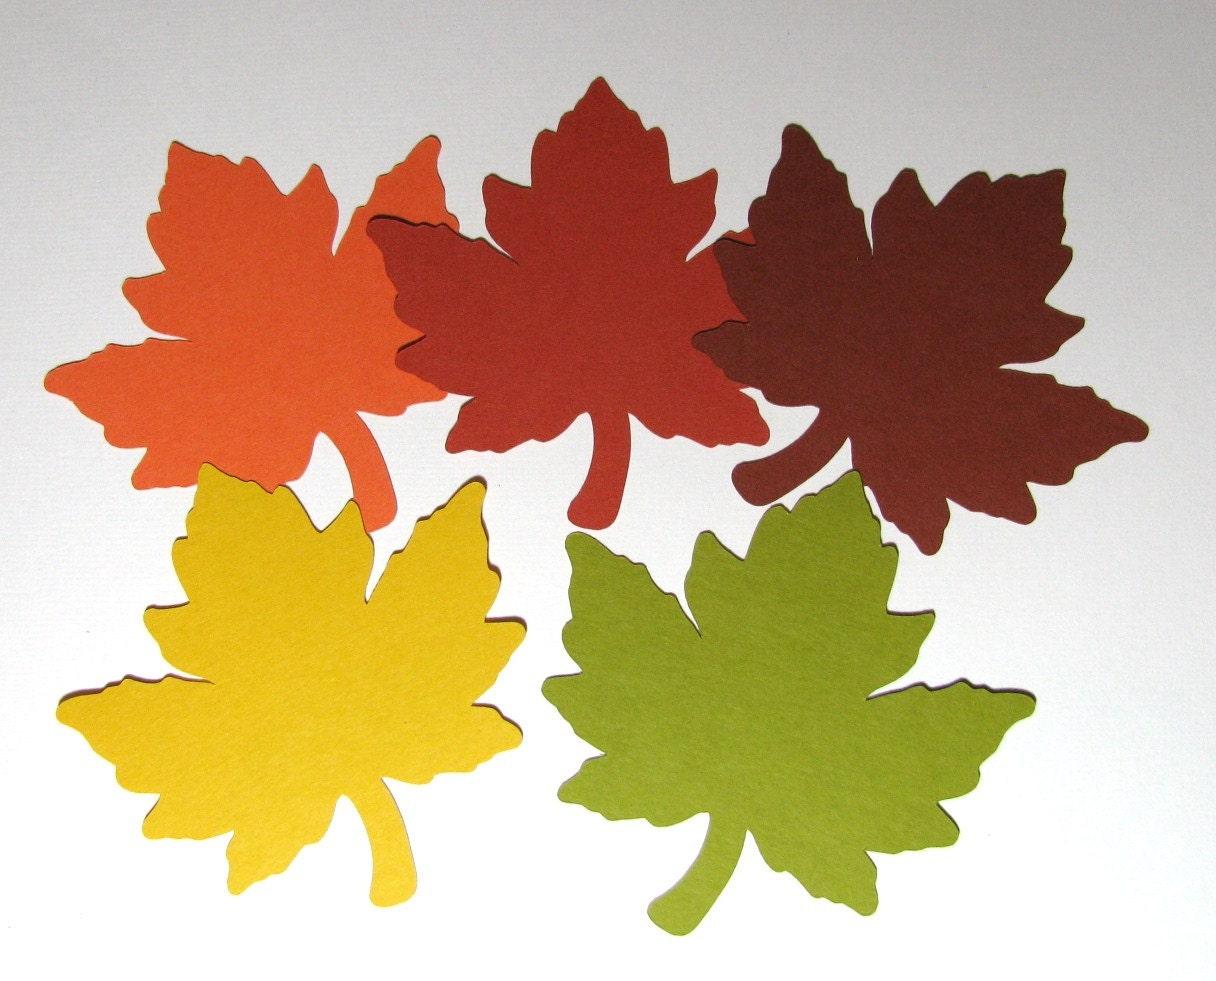 Giving Tree Invitations | Party Invitations Ideas